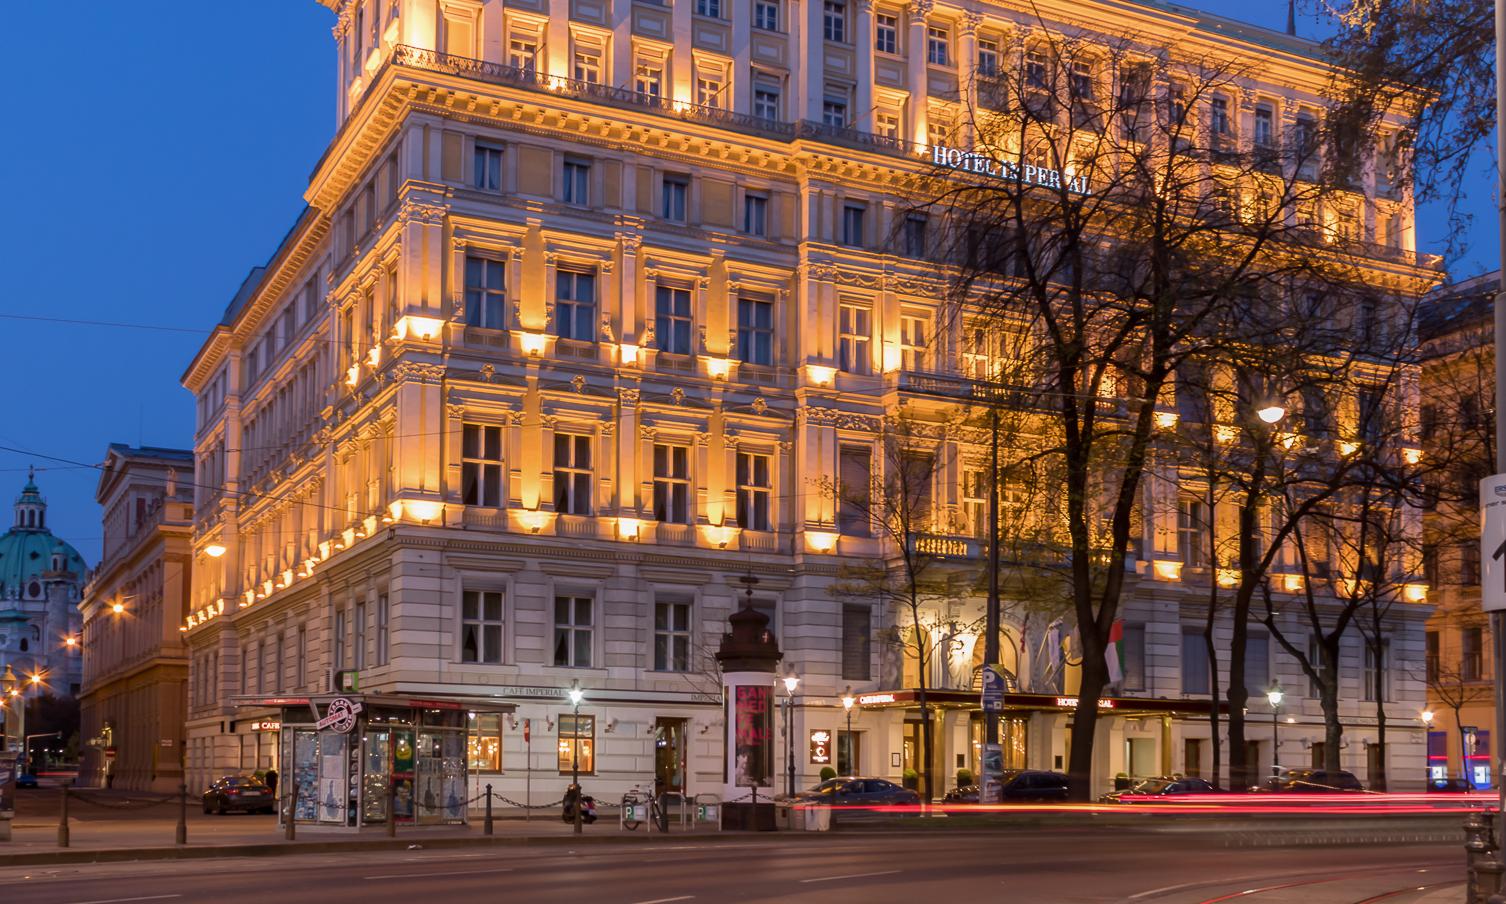 Wien bei Nacht | story.one